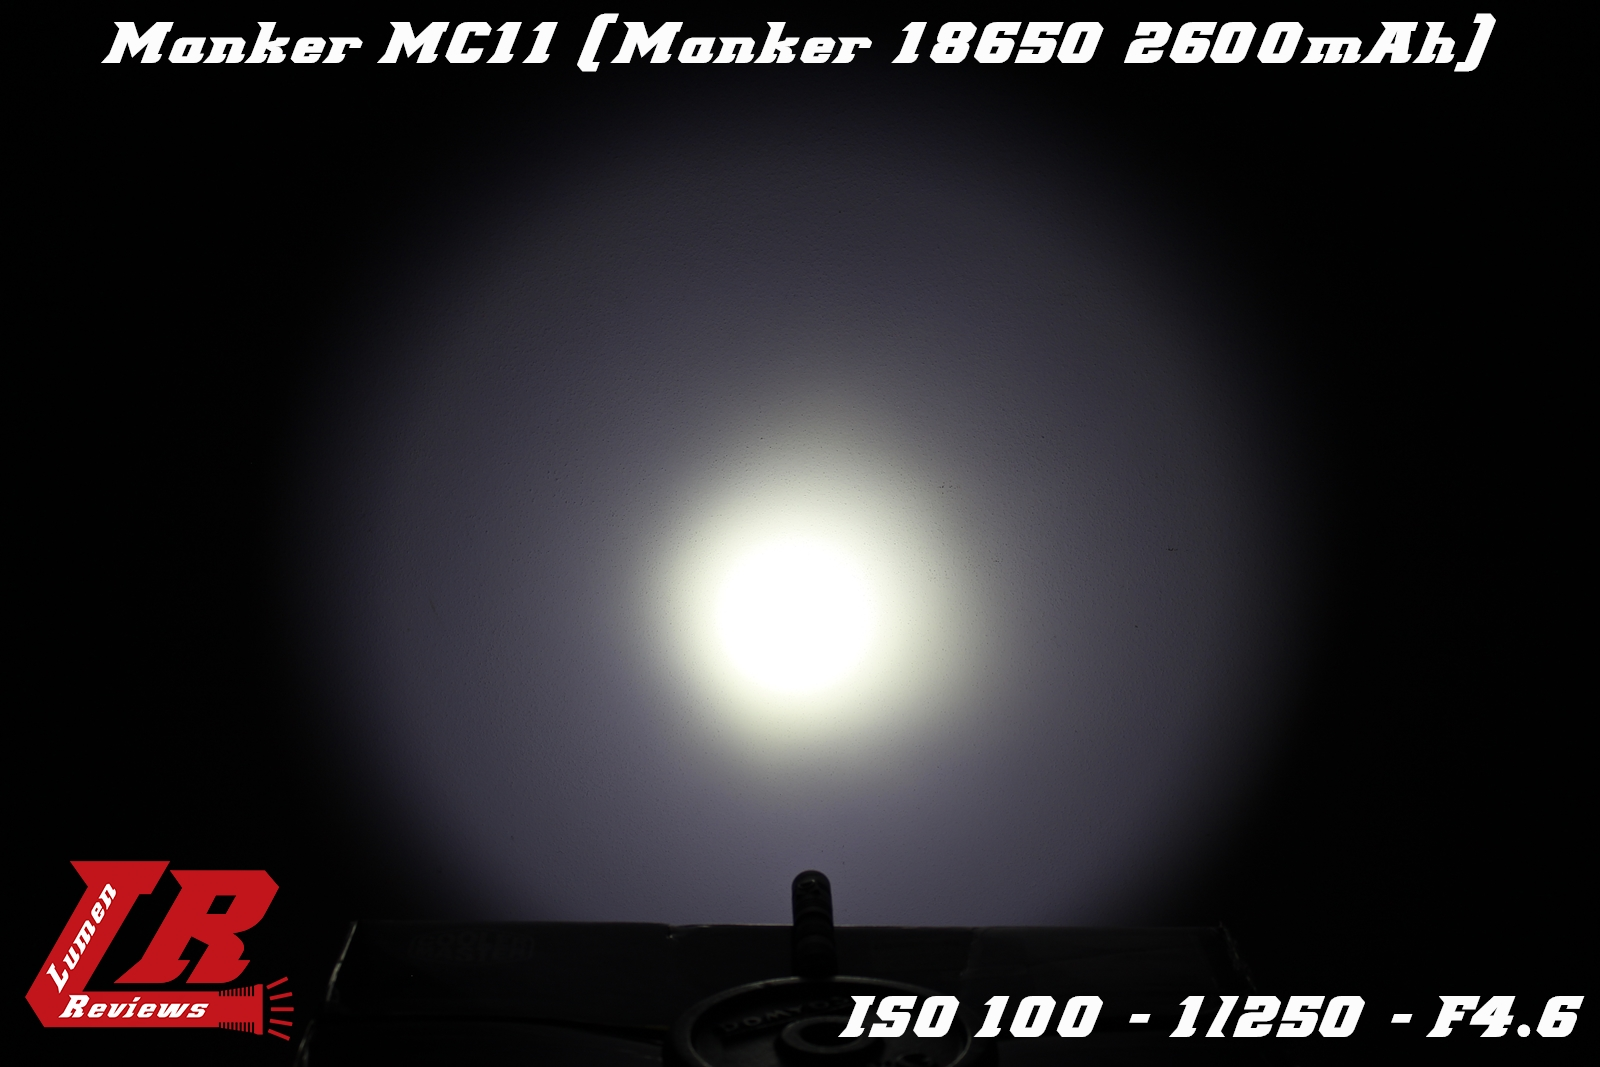 Manker MC11 BS 4